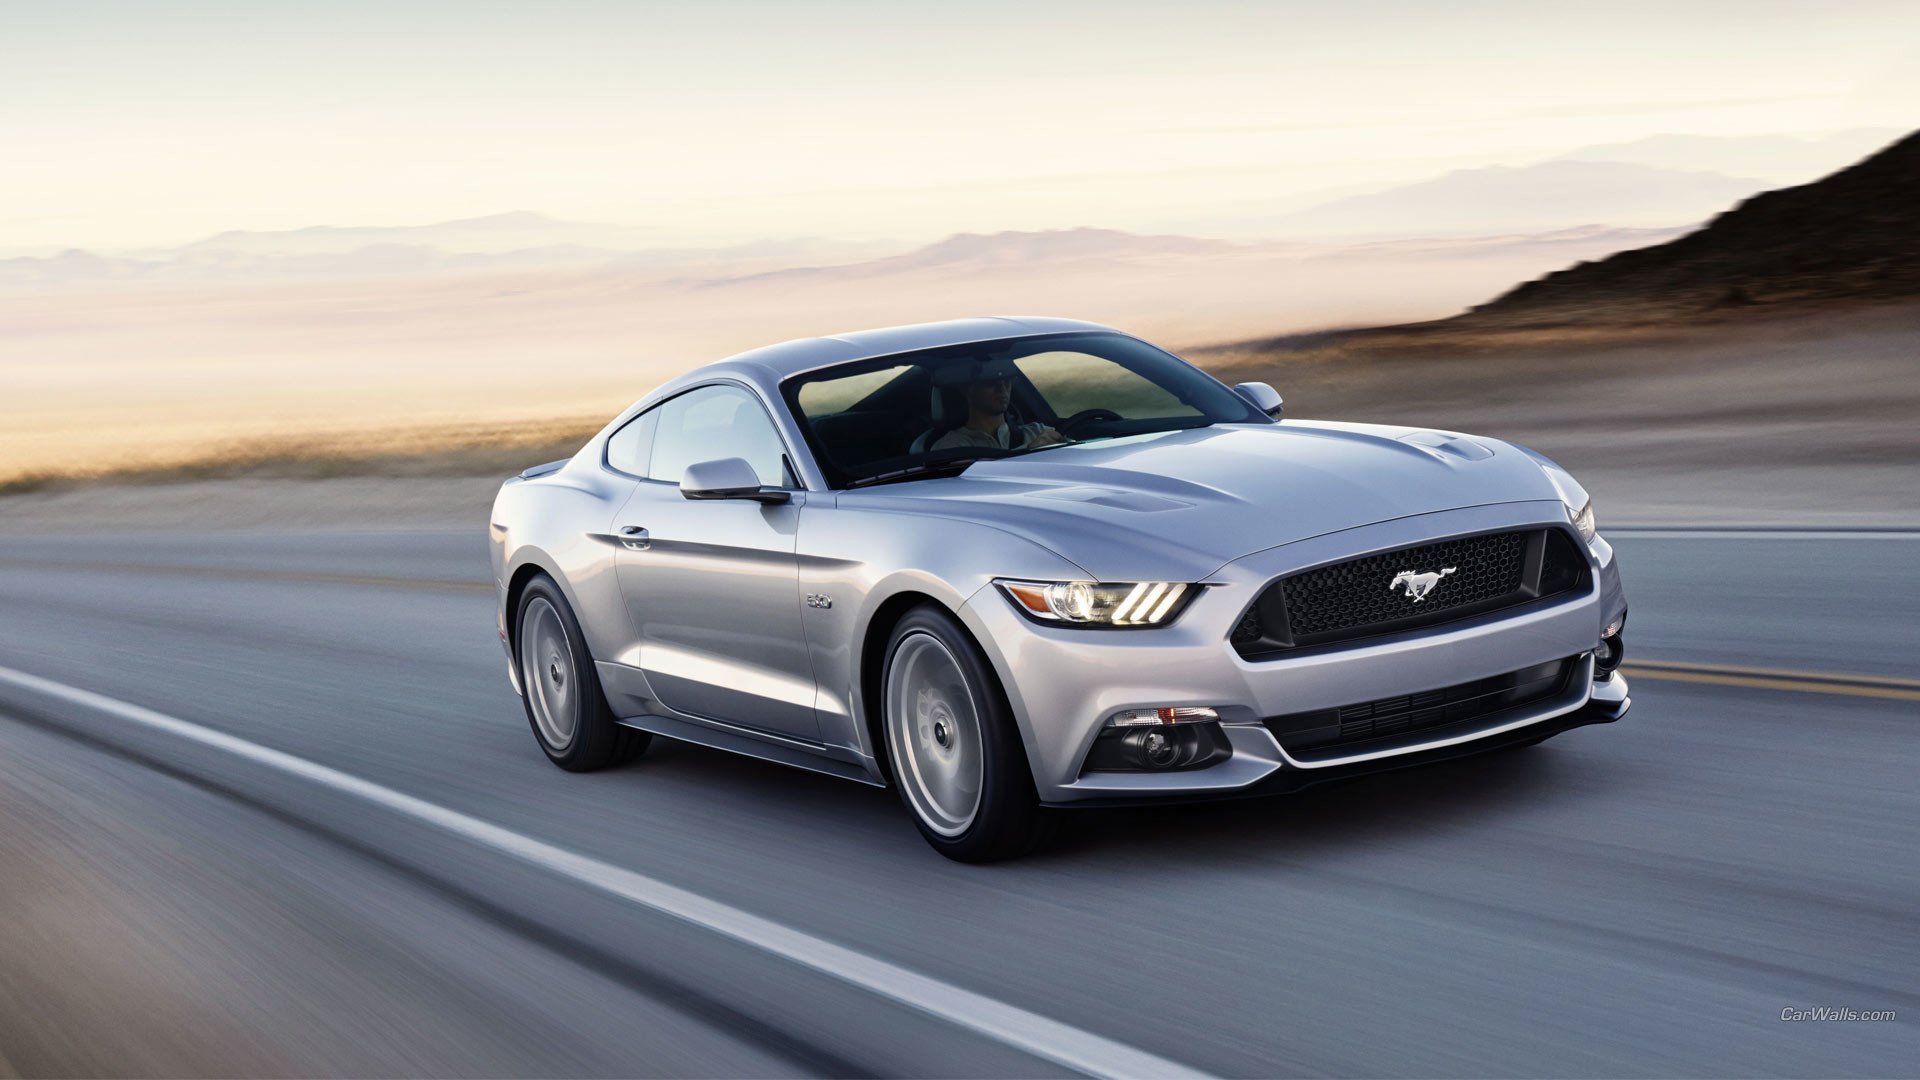 Mustang wallpaper 7